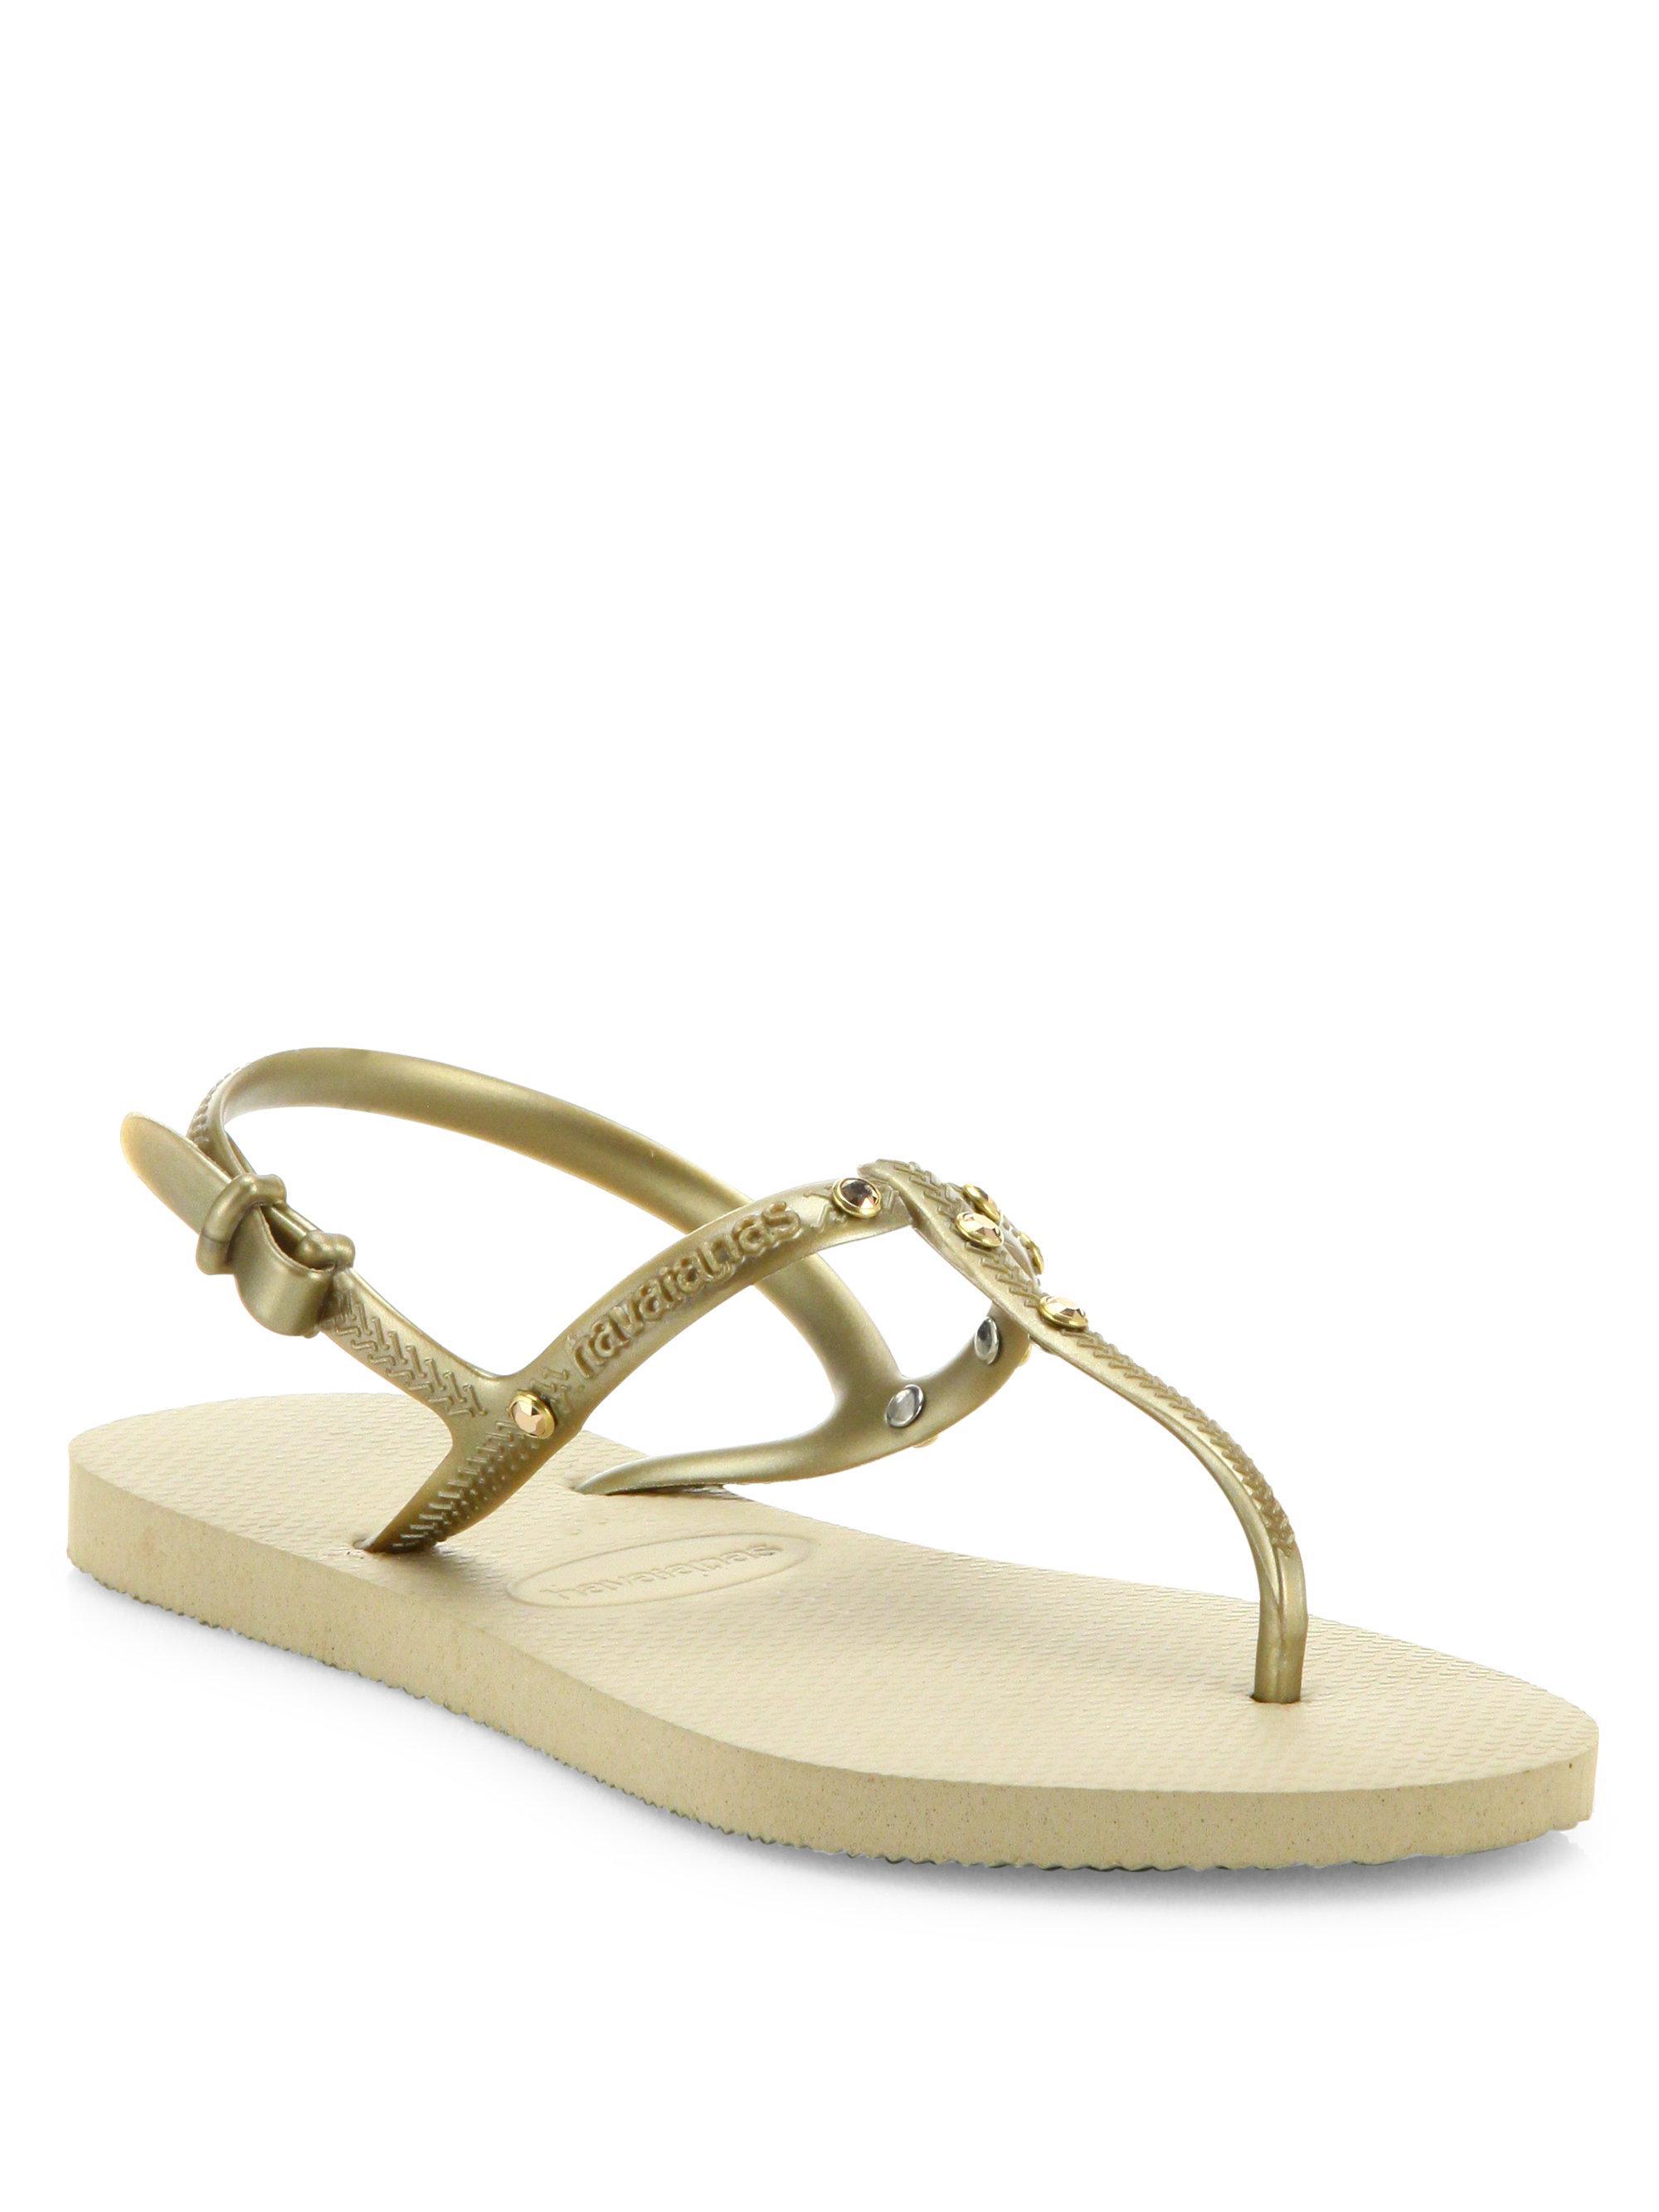 69e425661531 Lyst - Havaianas Freedom Crystal Swarovski Slingback Sandals